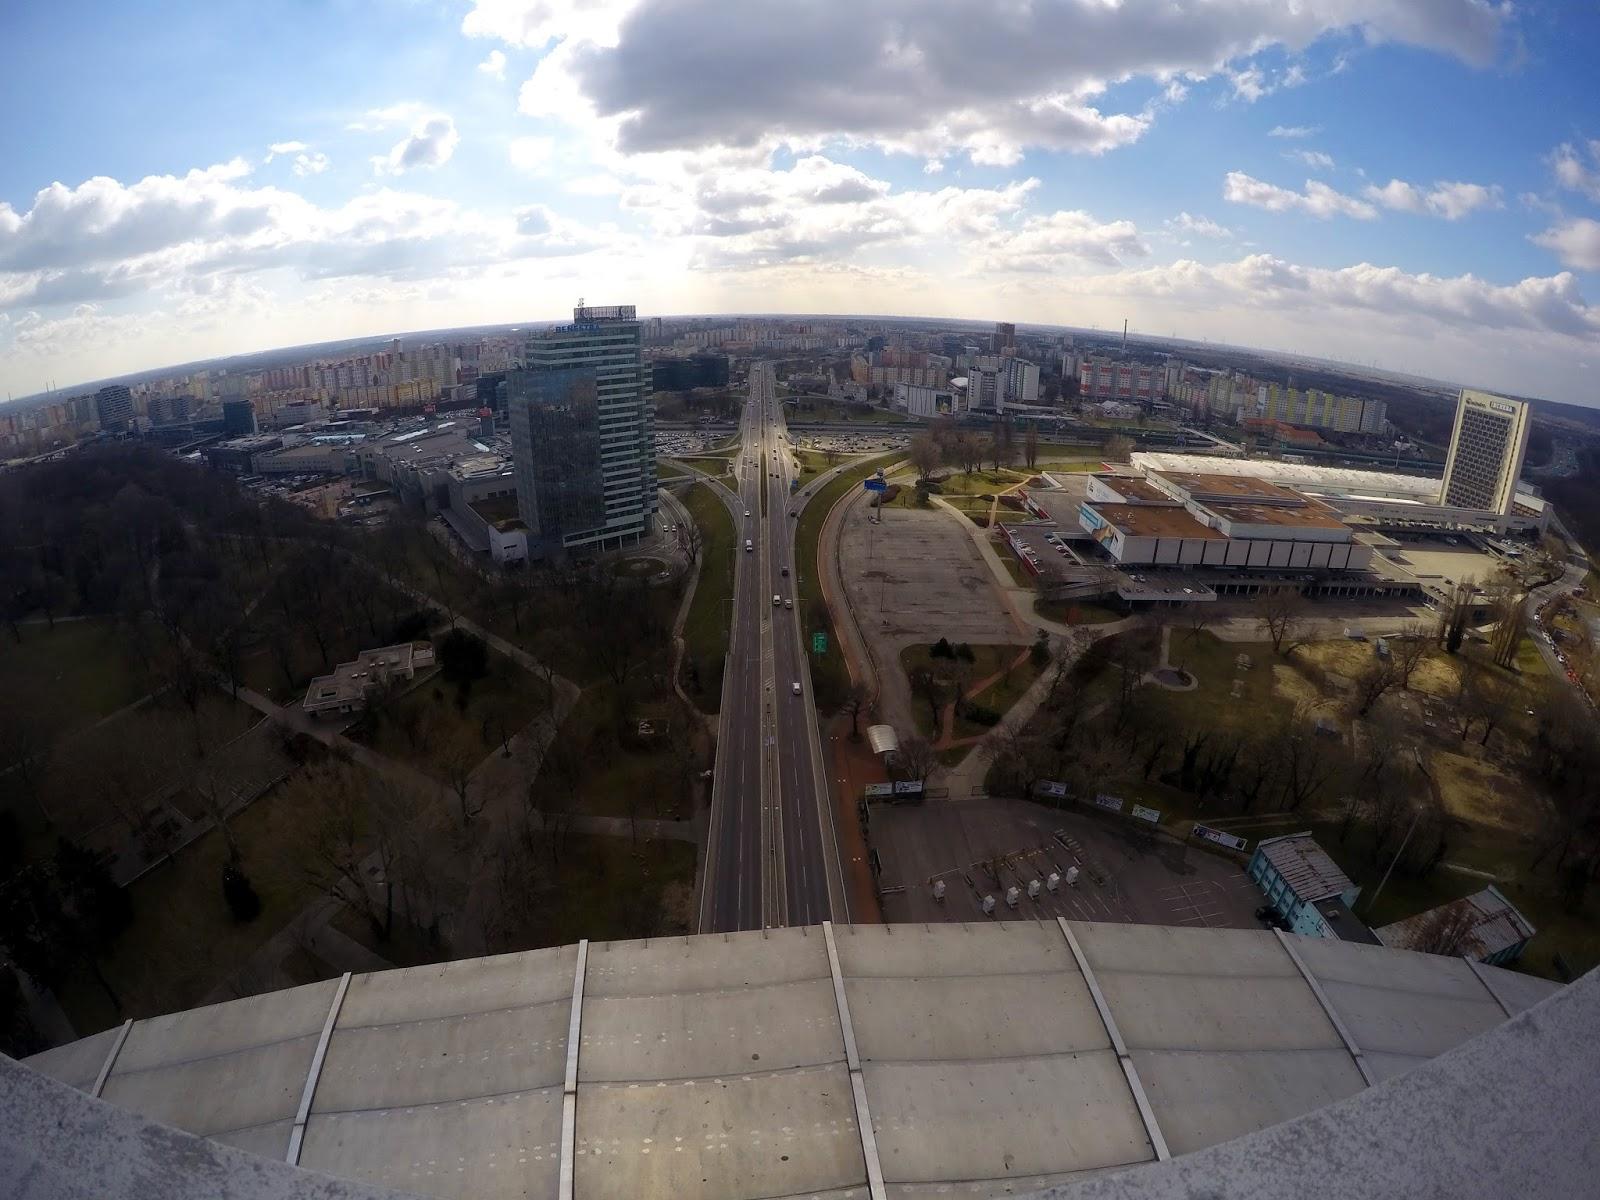 Slovakia, Bratislava, off the beaten track, eastern europe, eu, historical city, on the danube, ufo, bridge, communist